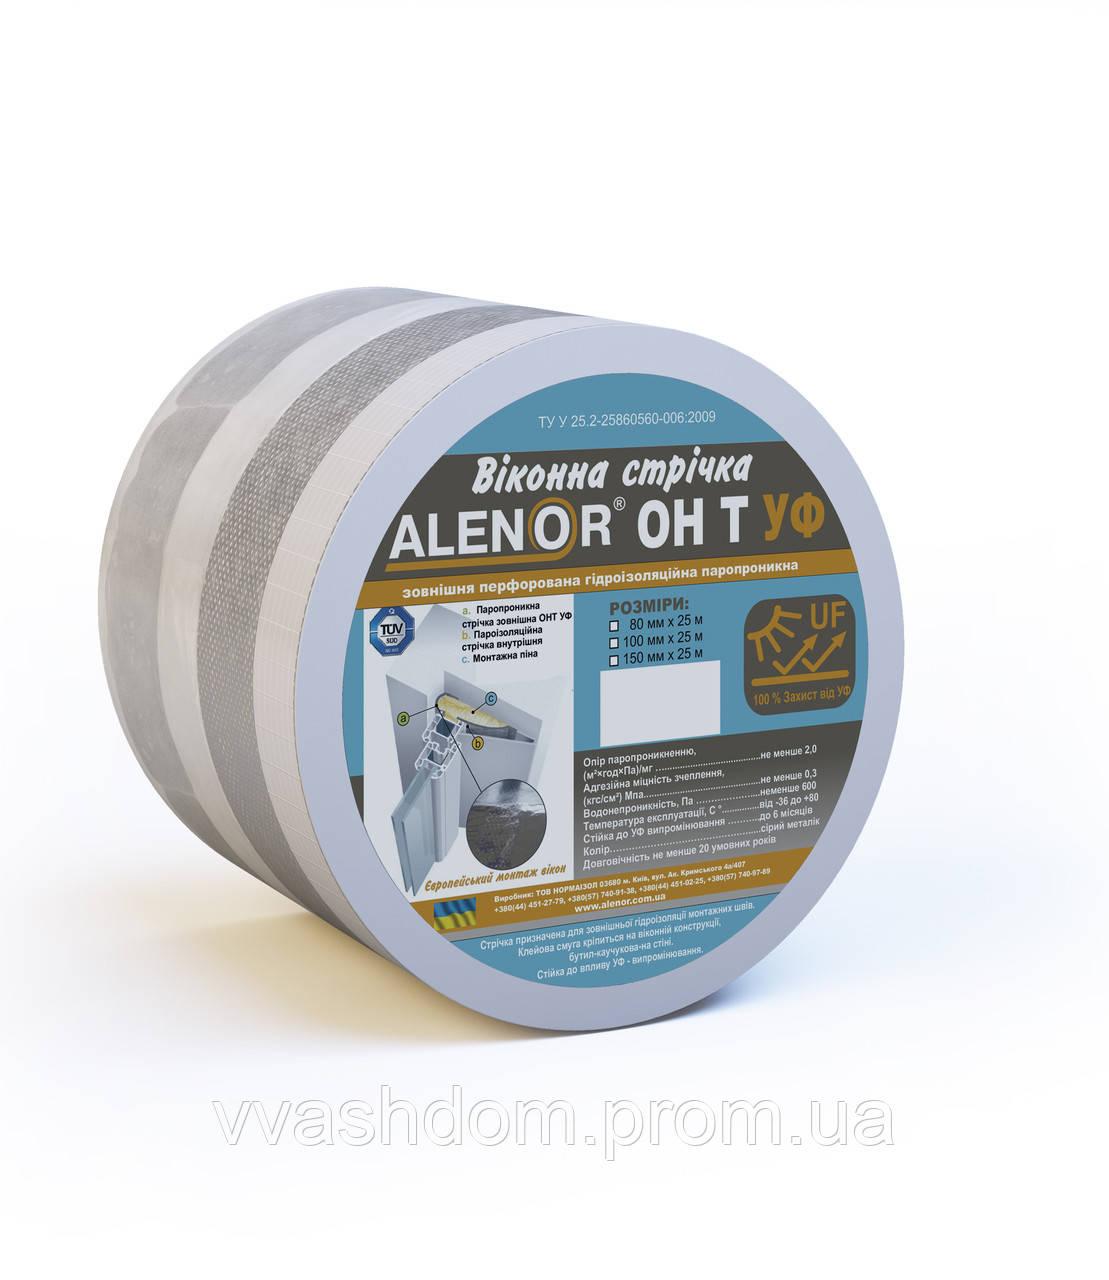 Лента монтажная оконная Аленор ОН УФ (фольгированная) наружная 80 мм (рулон 25м)